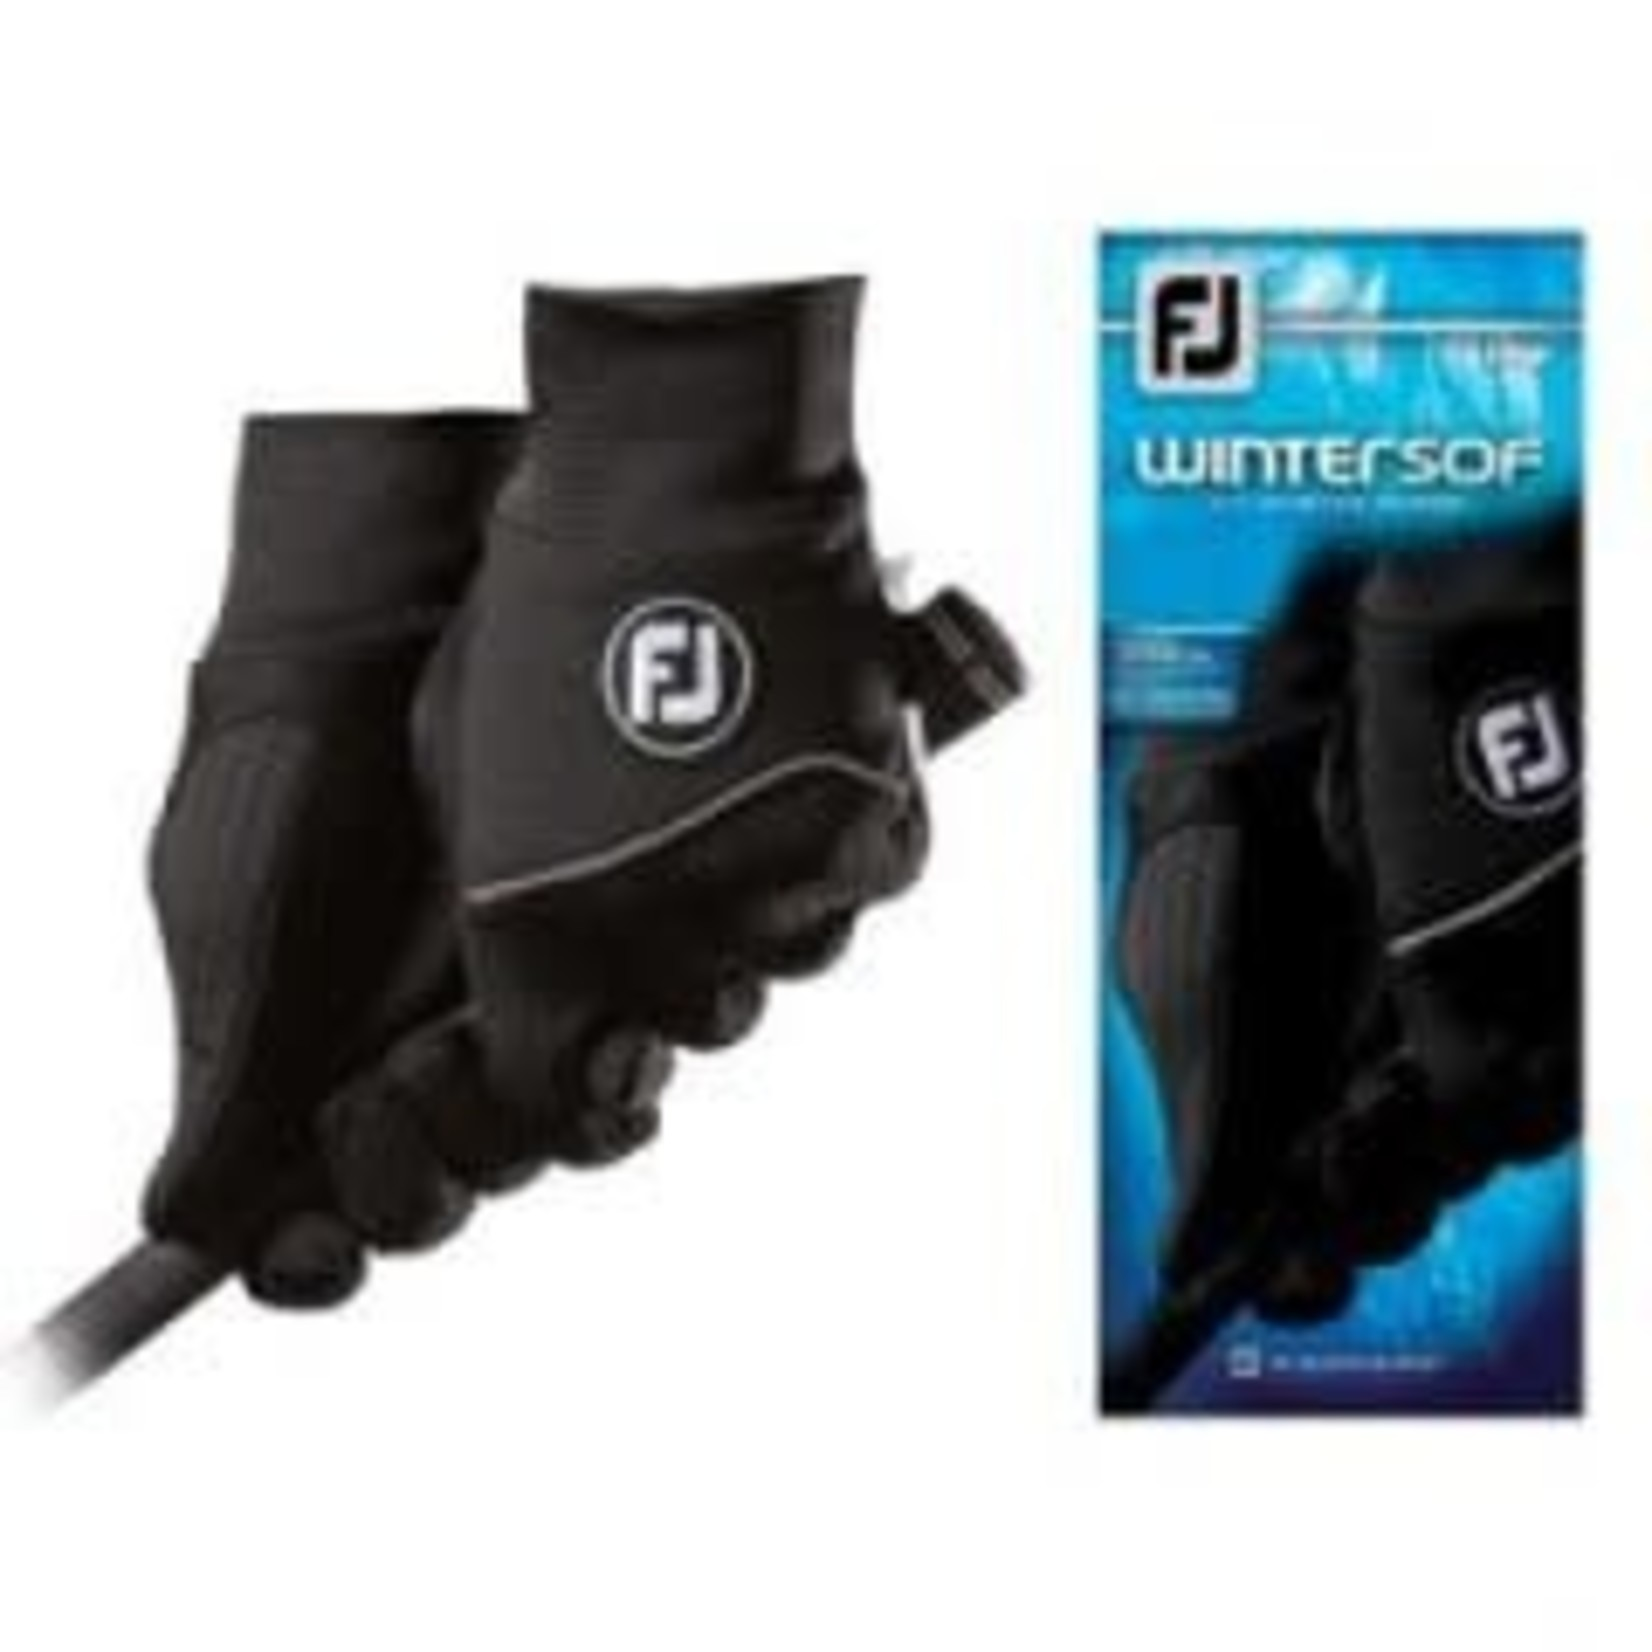 Footjoy FootJoy Wintersof Gloves Men's (pair) 66967E L